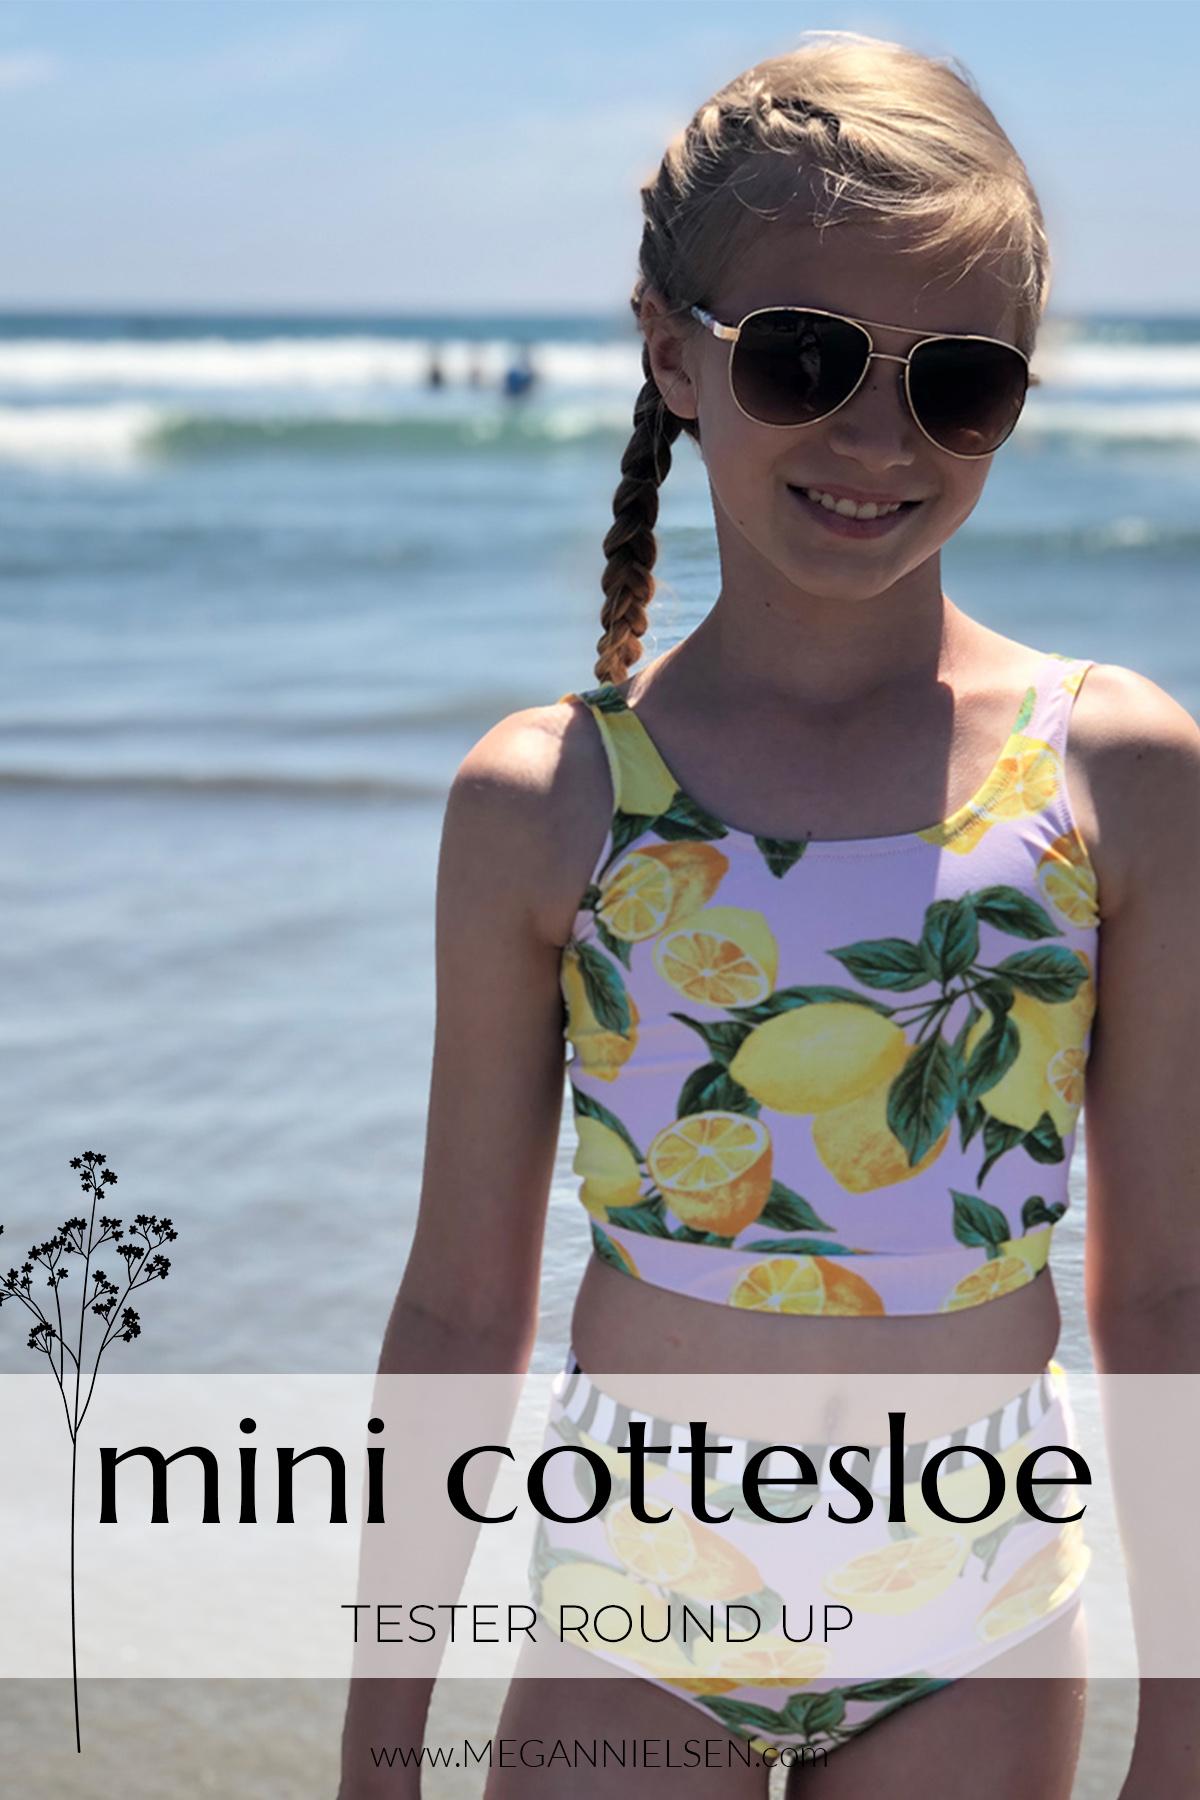 Mini Cottesloe Tester Round Up